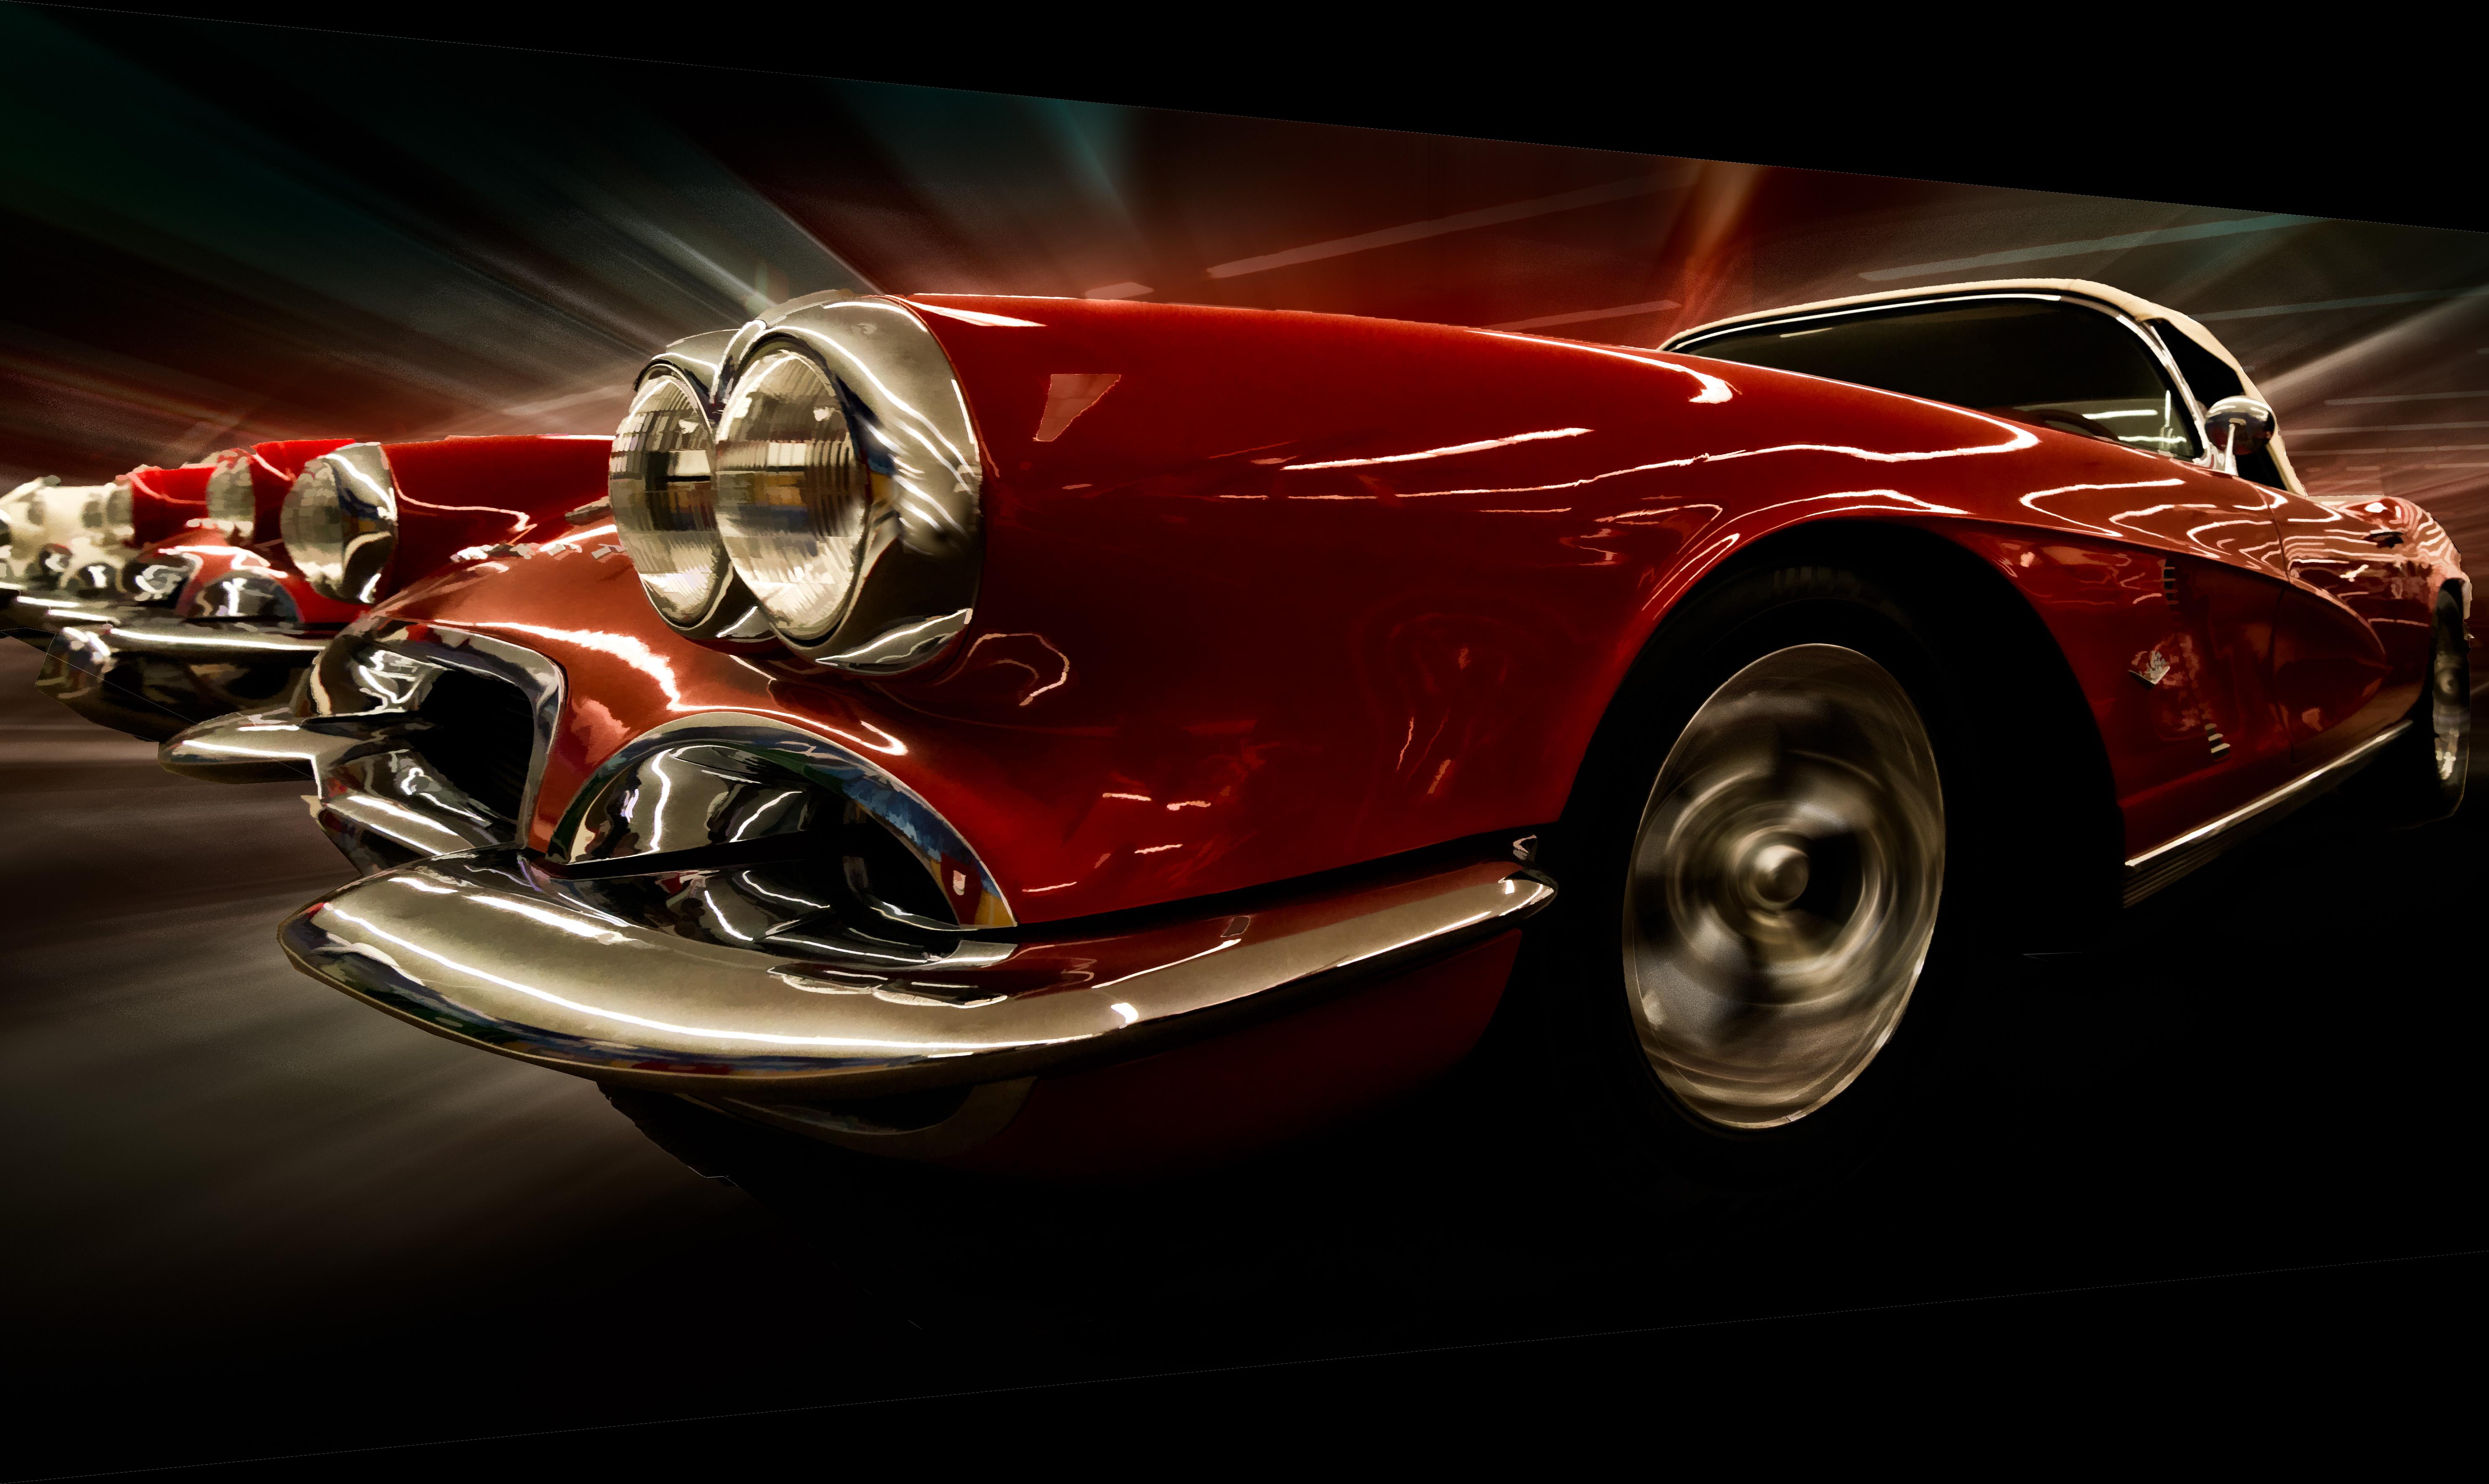 Wallpaper : Red, Sports Car, Vintage Car, Classic Car